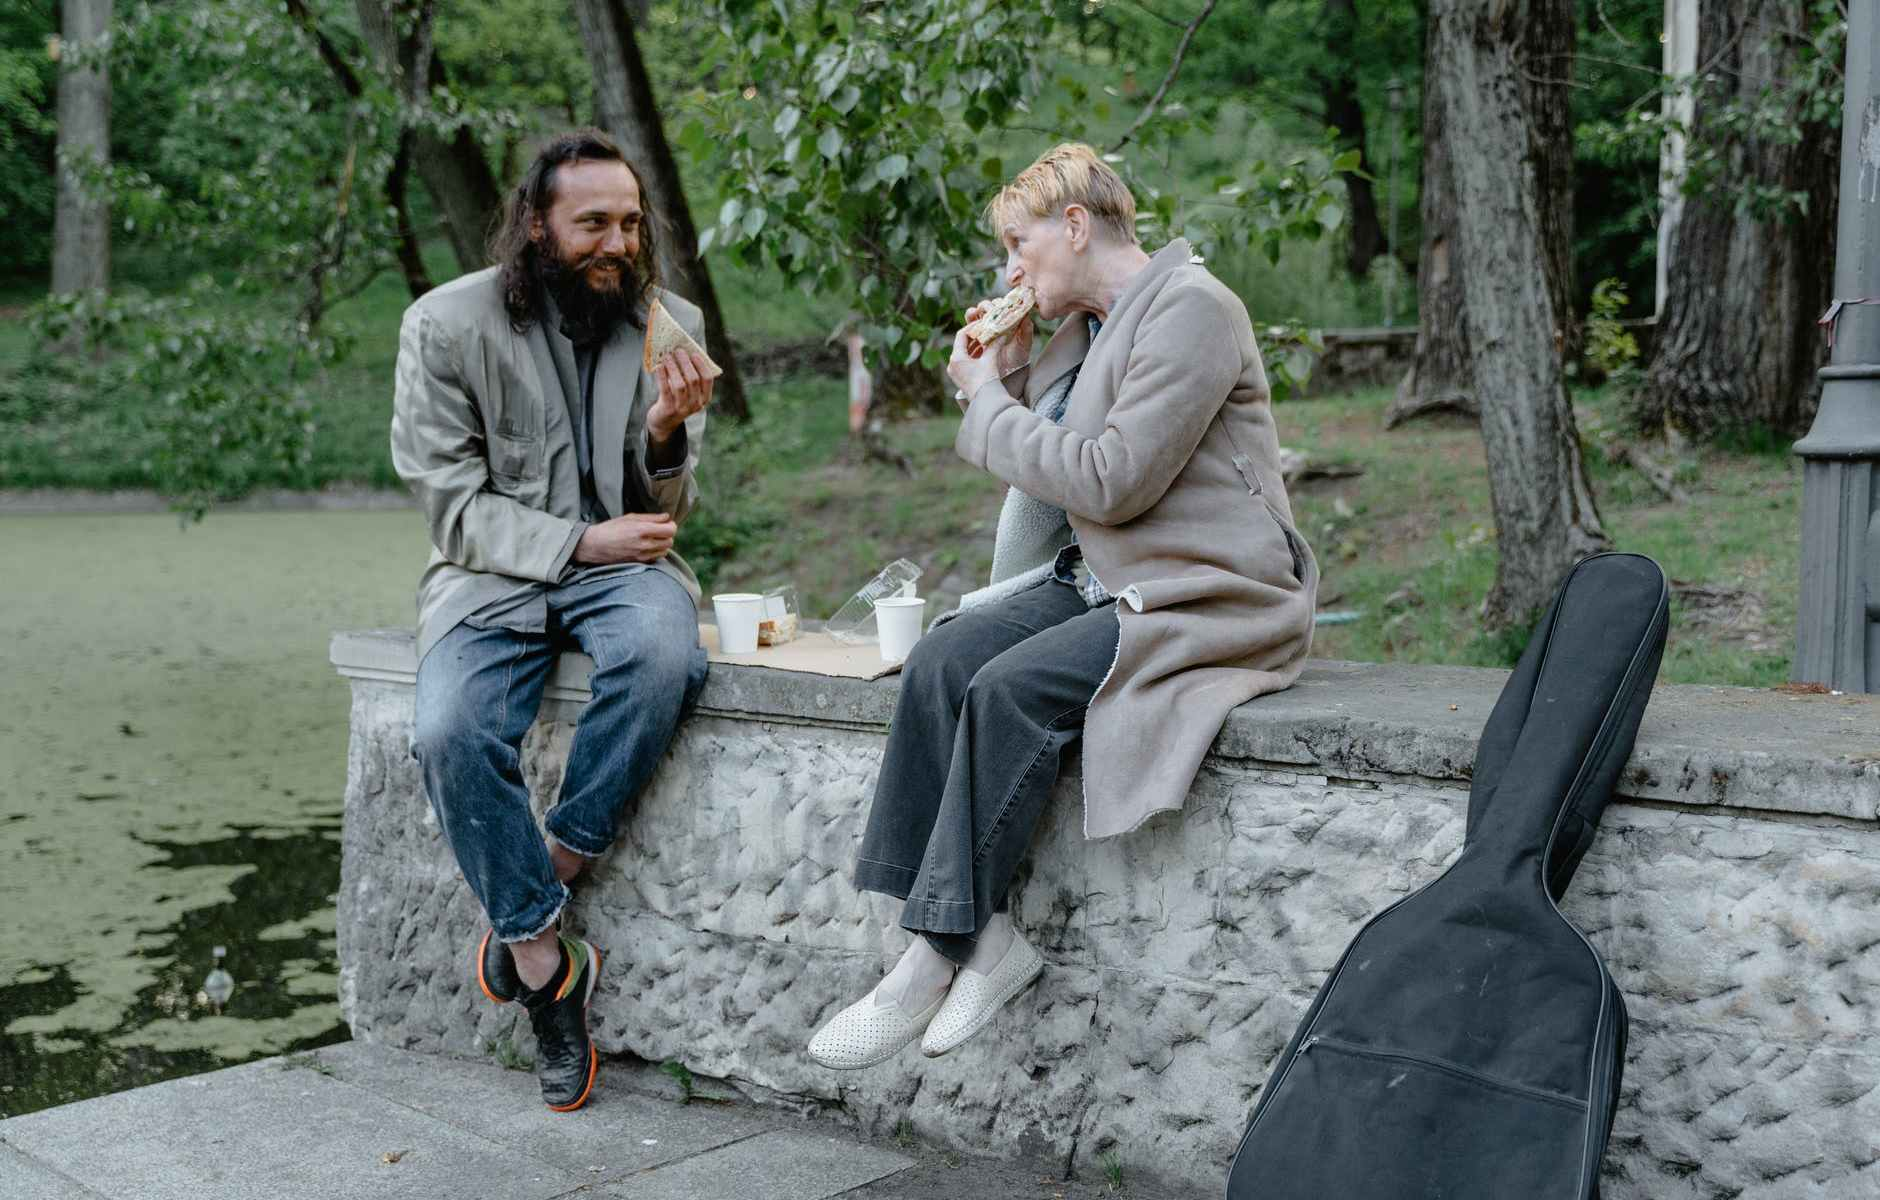 man and woman eating at a park